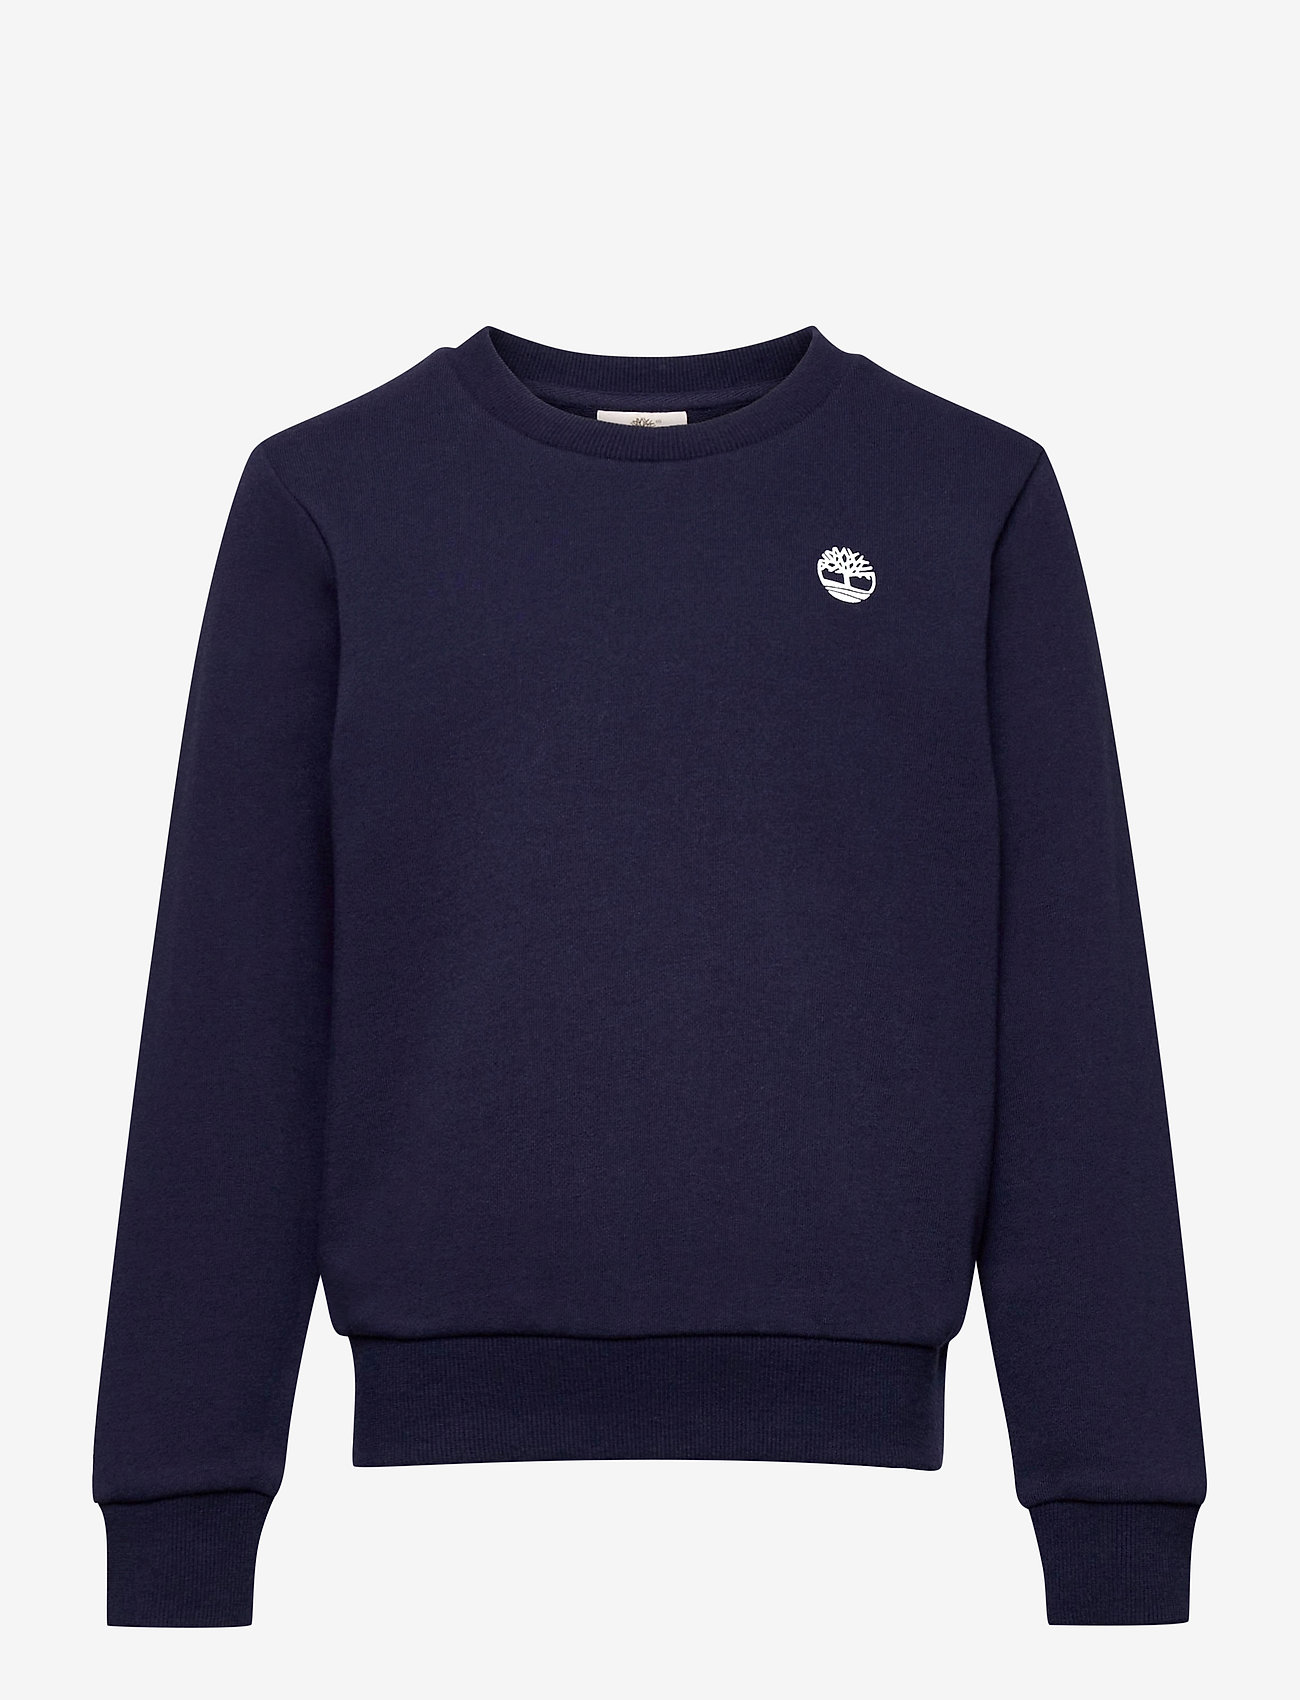 Timberland - SWEATSHIRT - sweatshirts - navy - 0